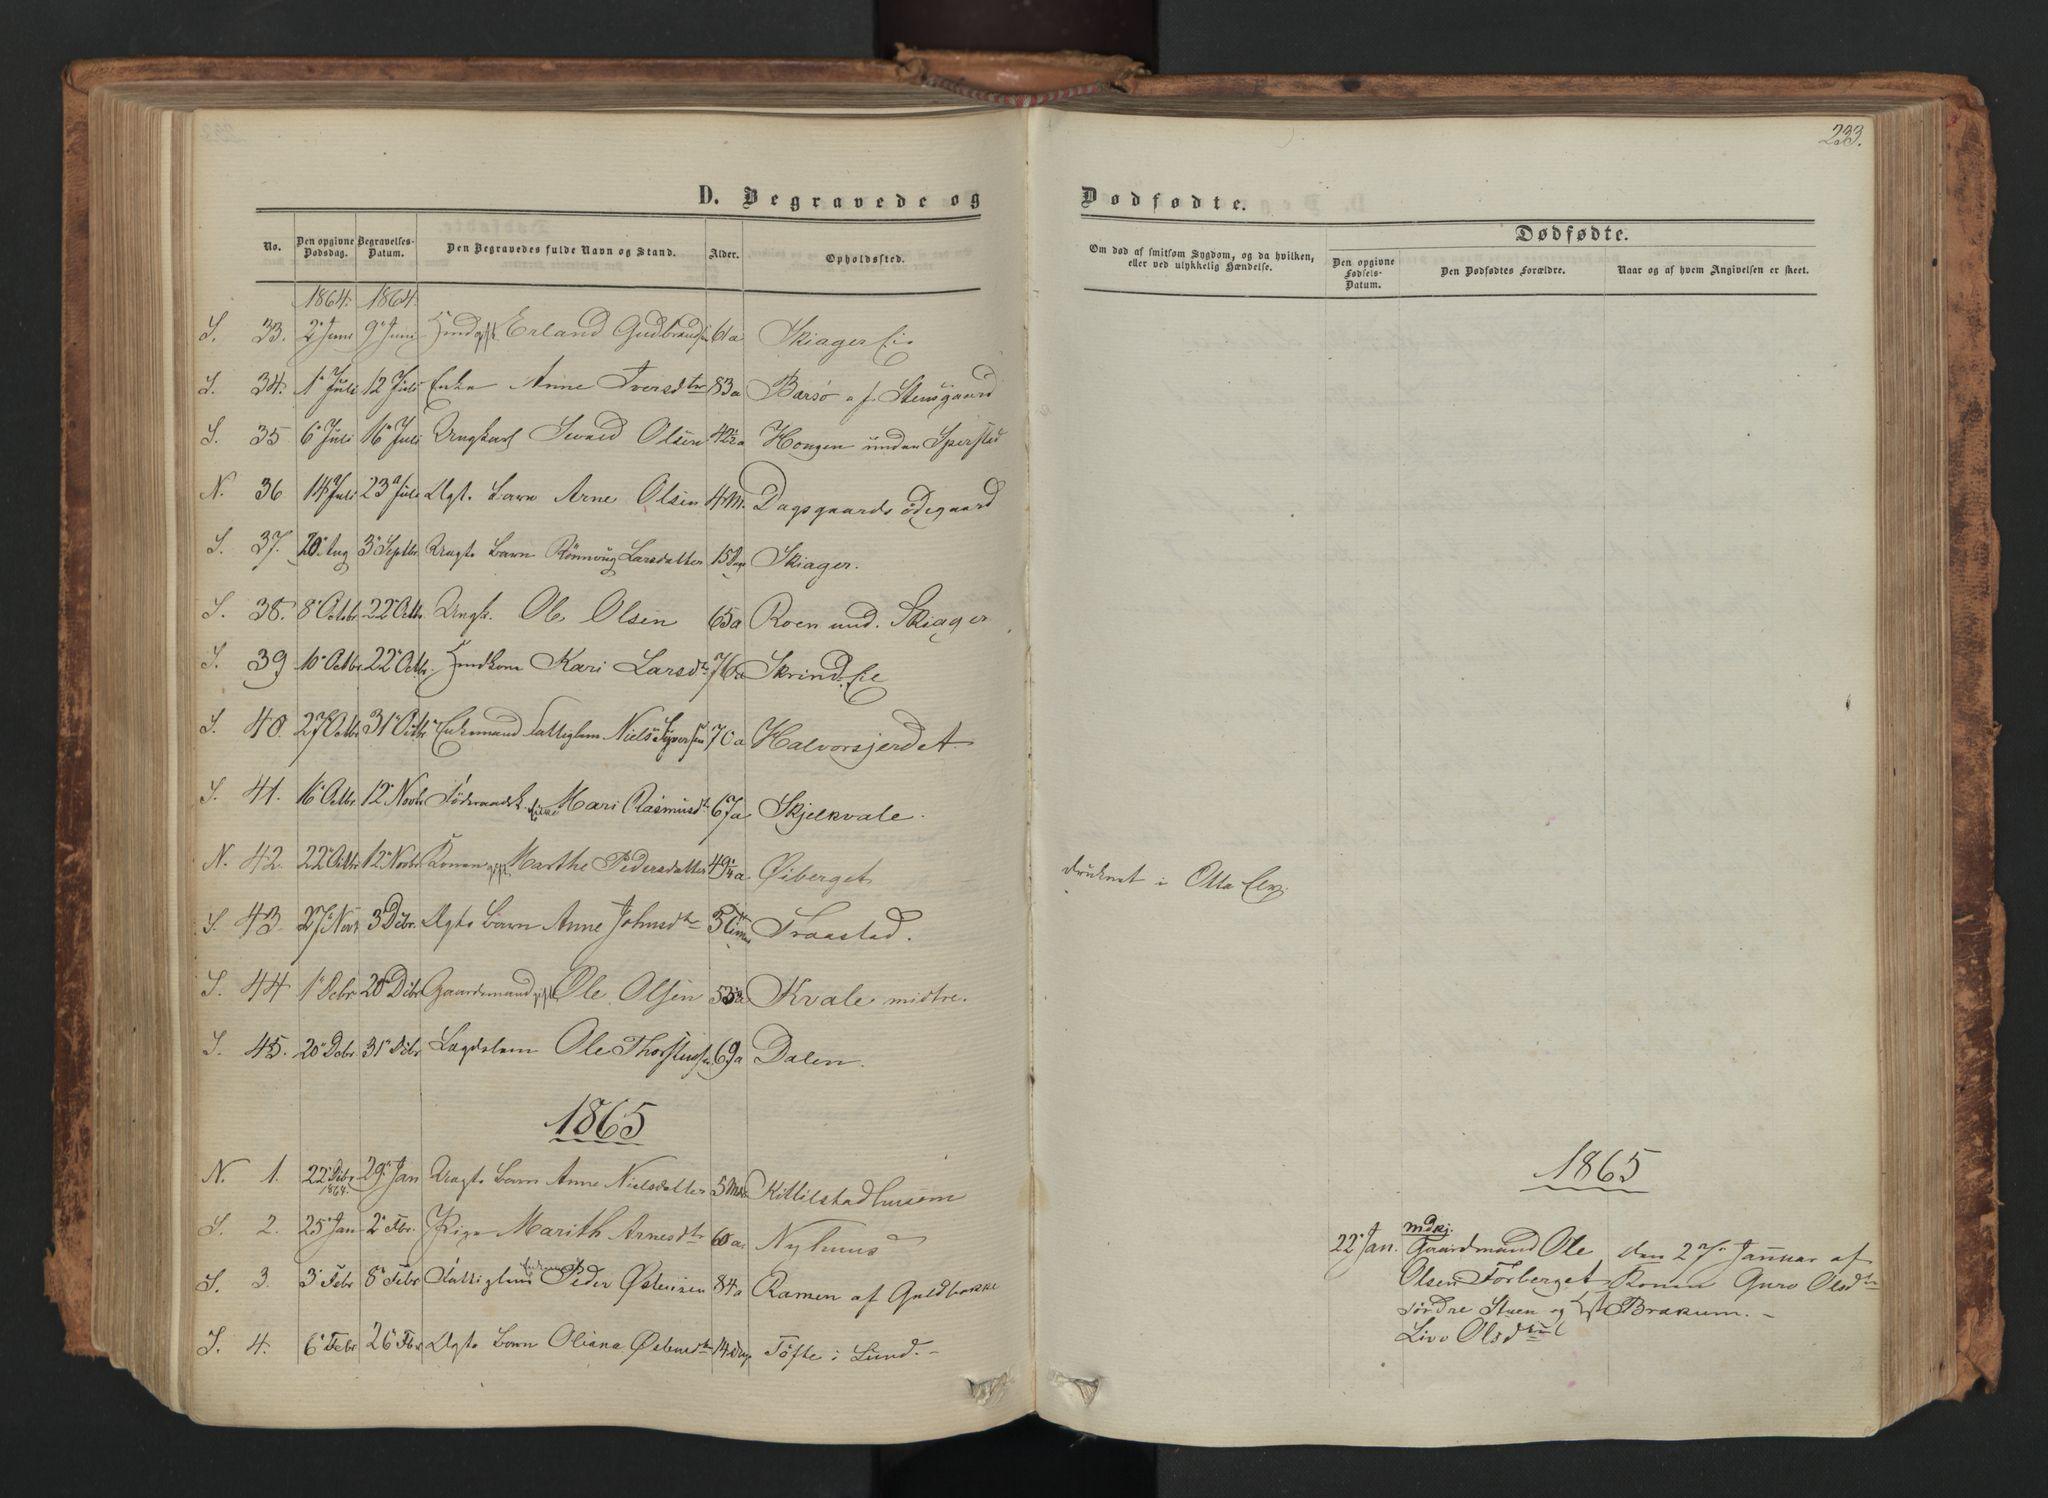 SAH, Skjåk prestekontor, Ministerialbok nr. 1, 1863-1879, s. 233